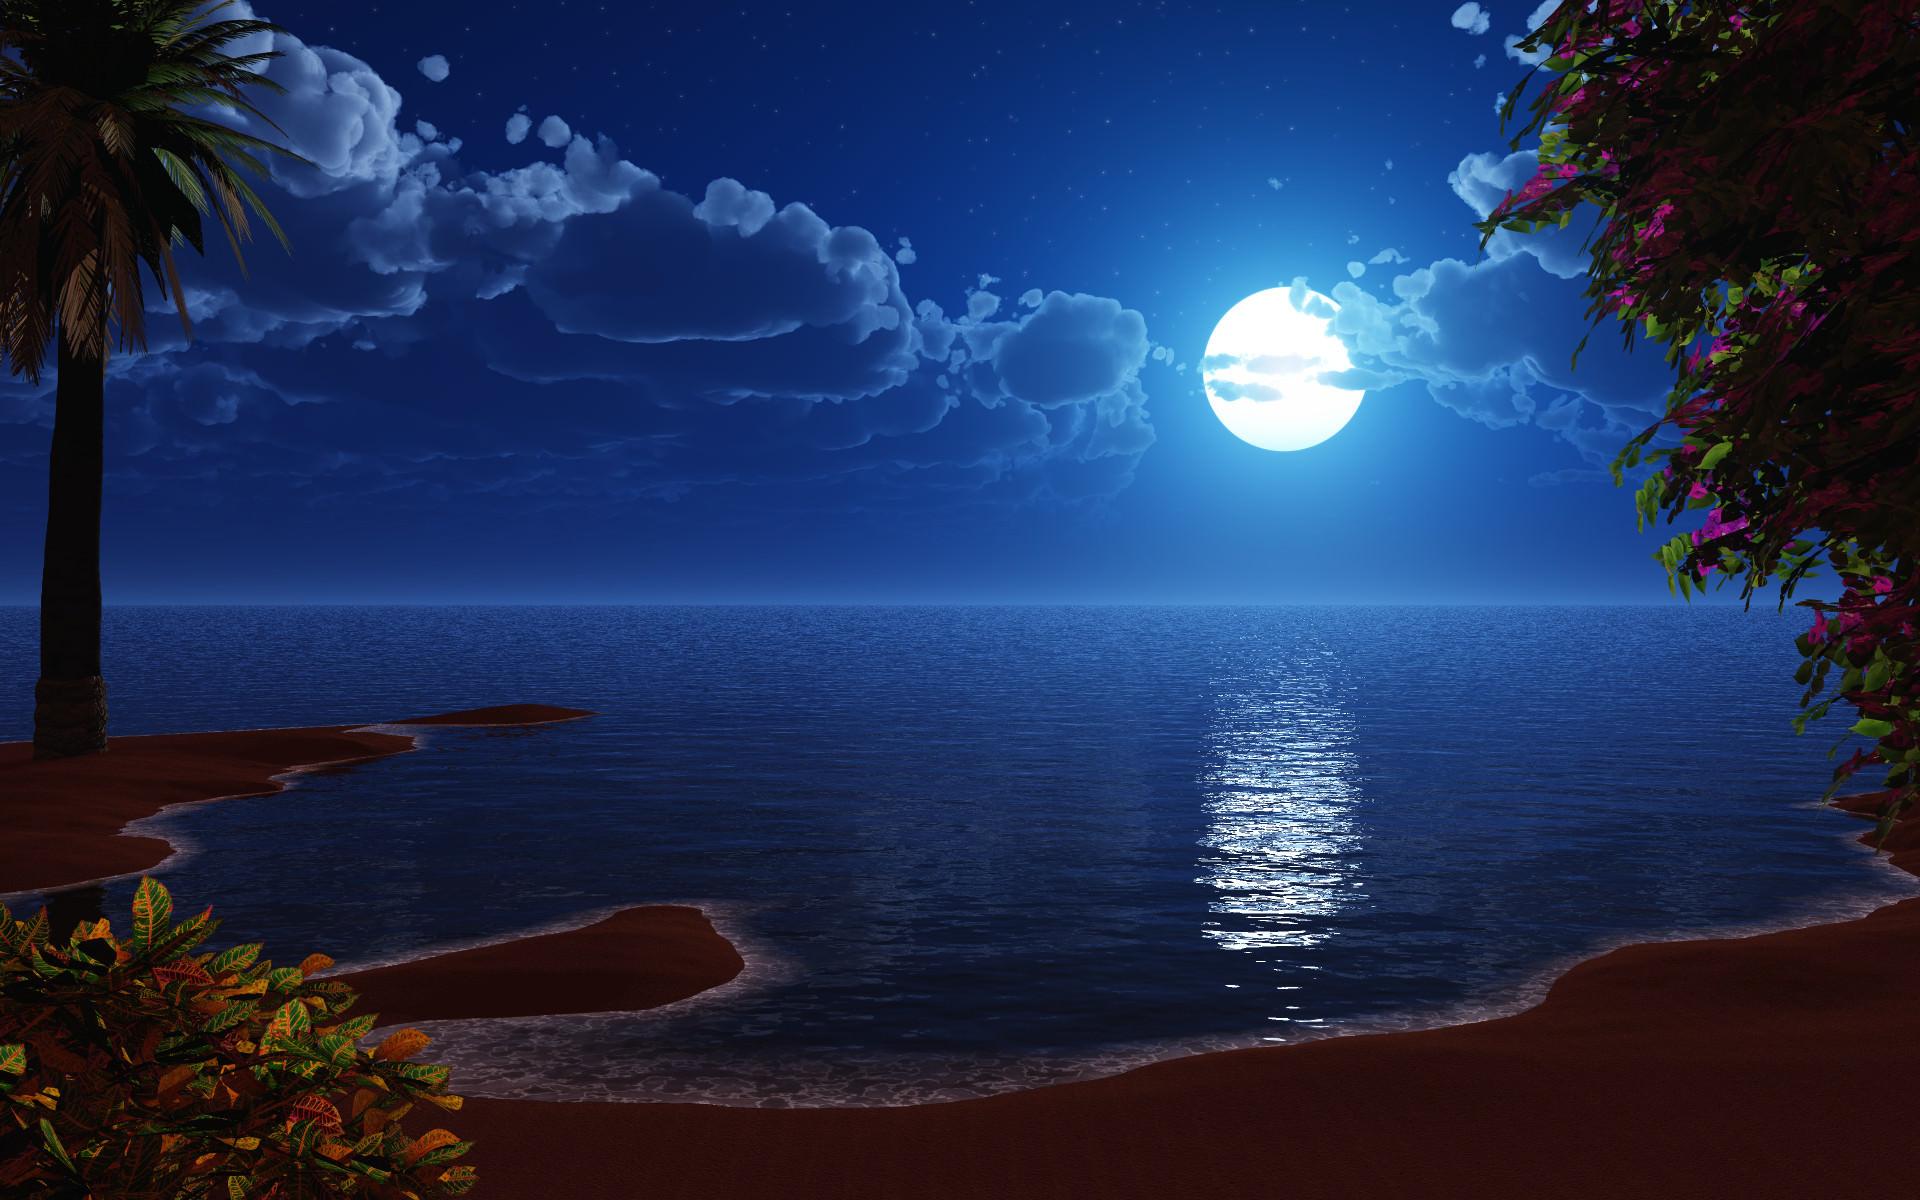 HD Moonlight Wallpapers and Photos HD Fantasy Wallpapers